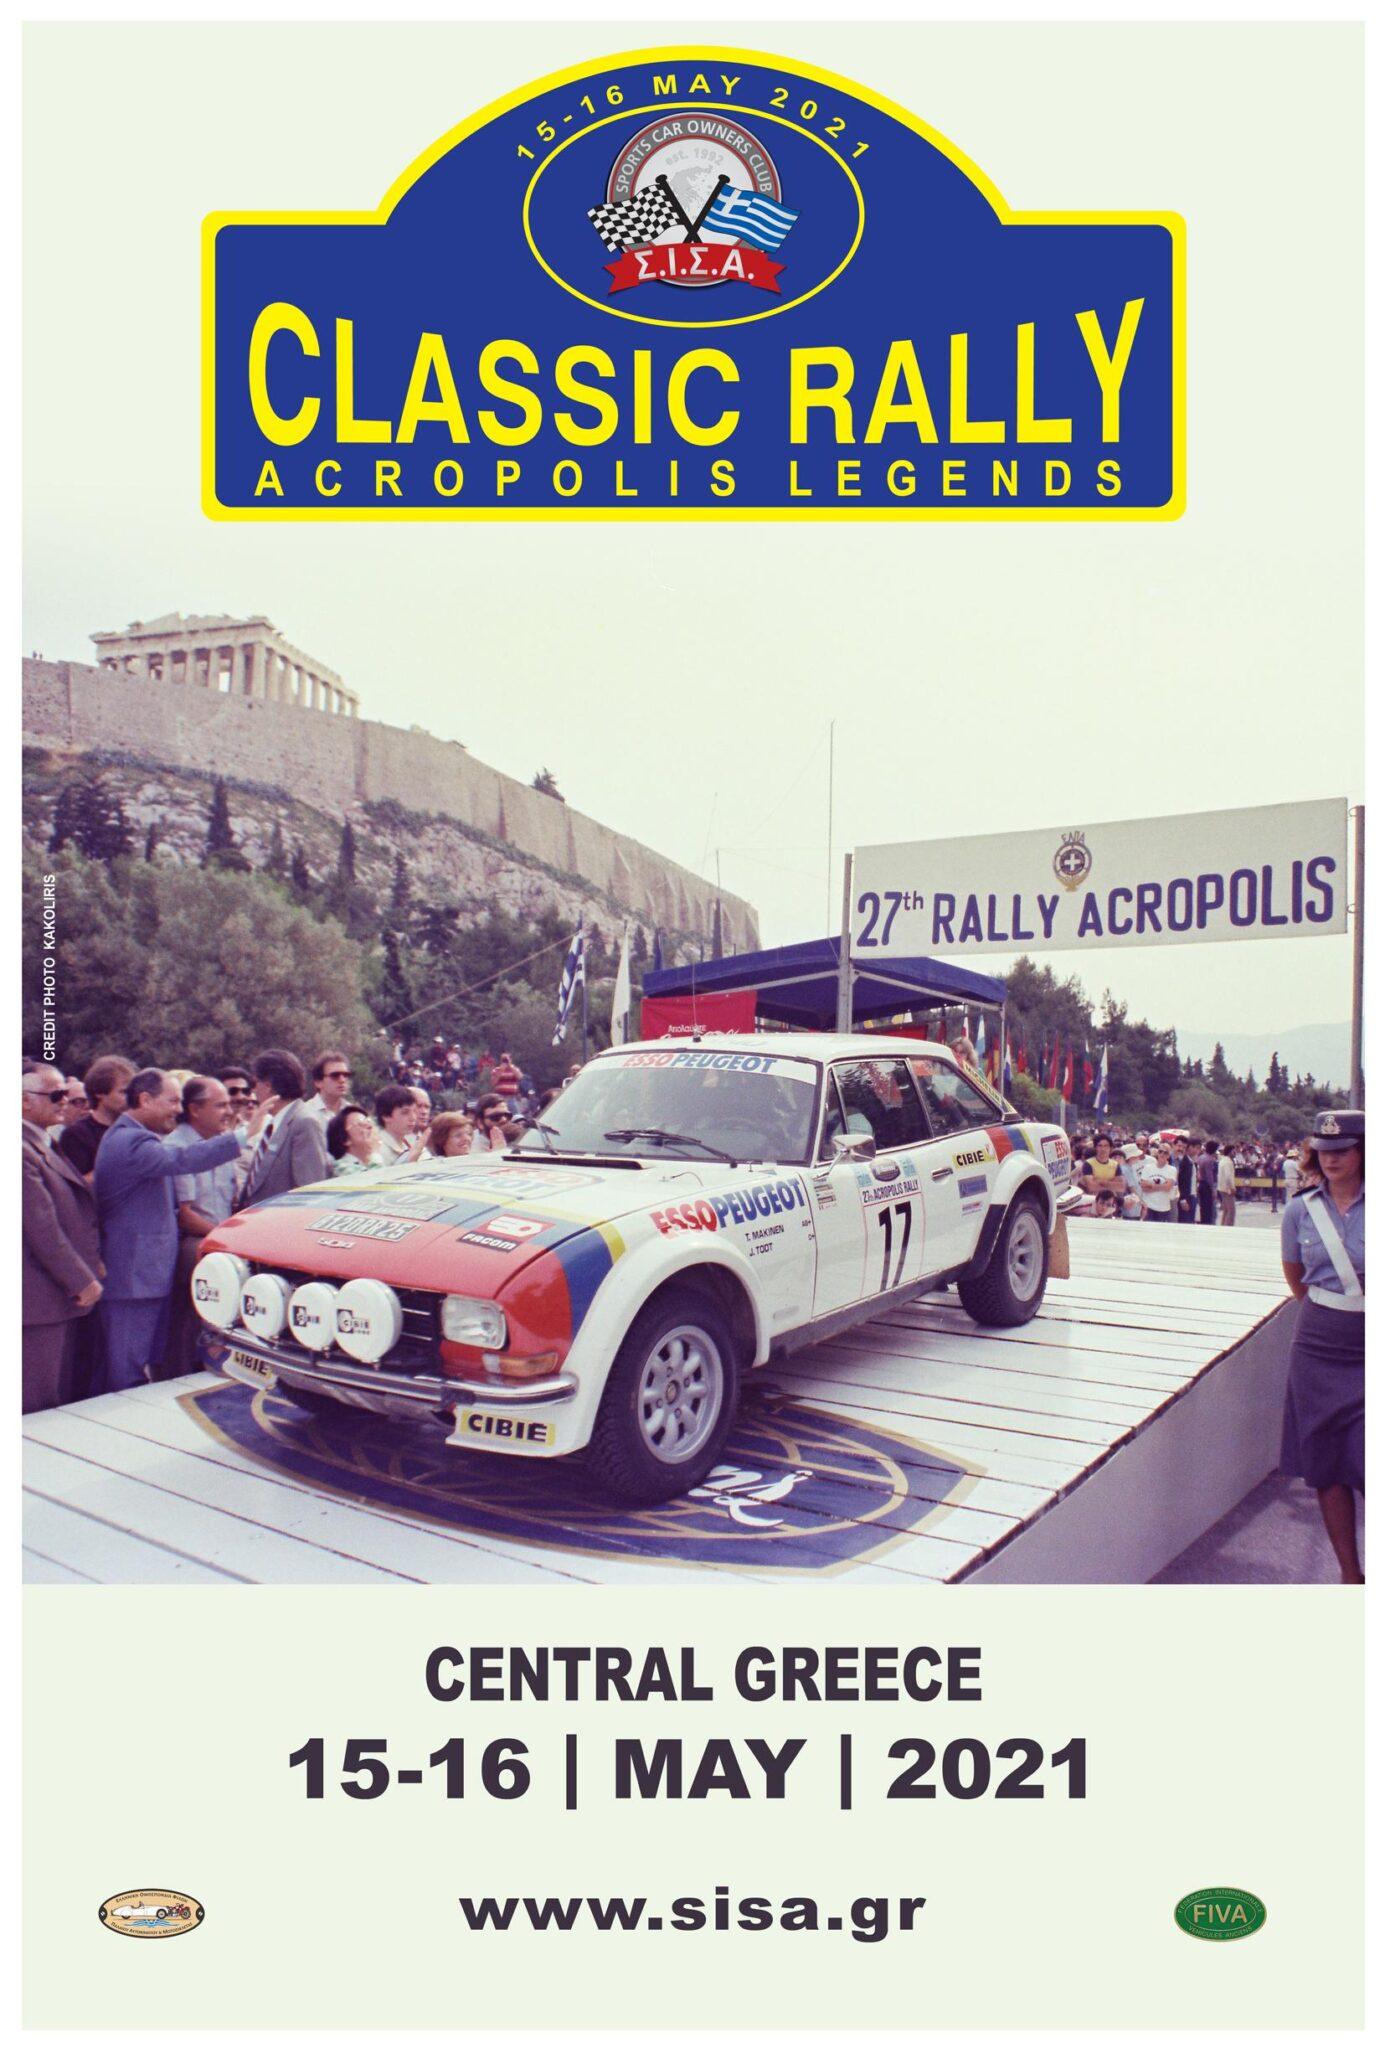 Classic Rally Acropolis legends : Συμμετοχές - Πρόγραμμα - Roadbook